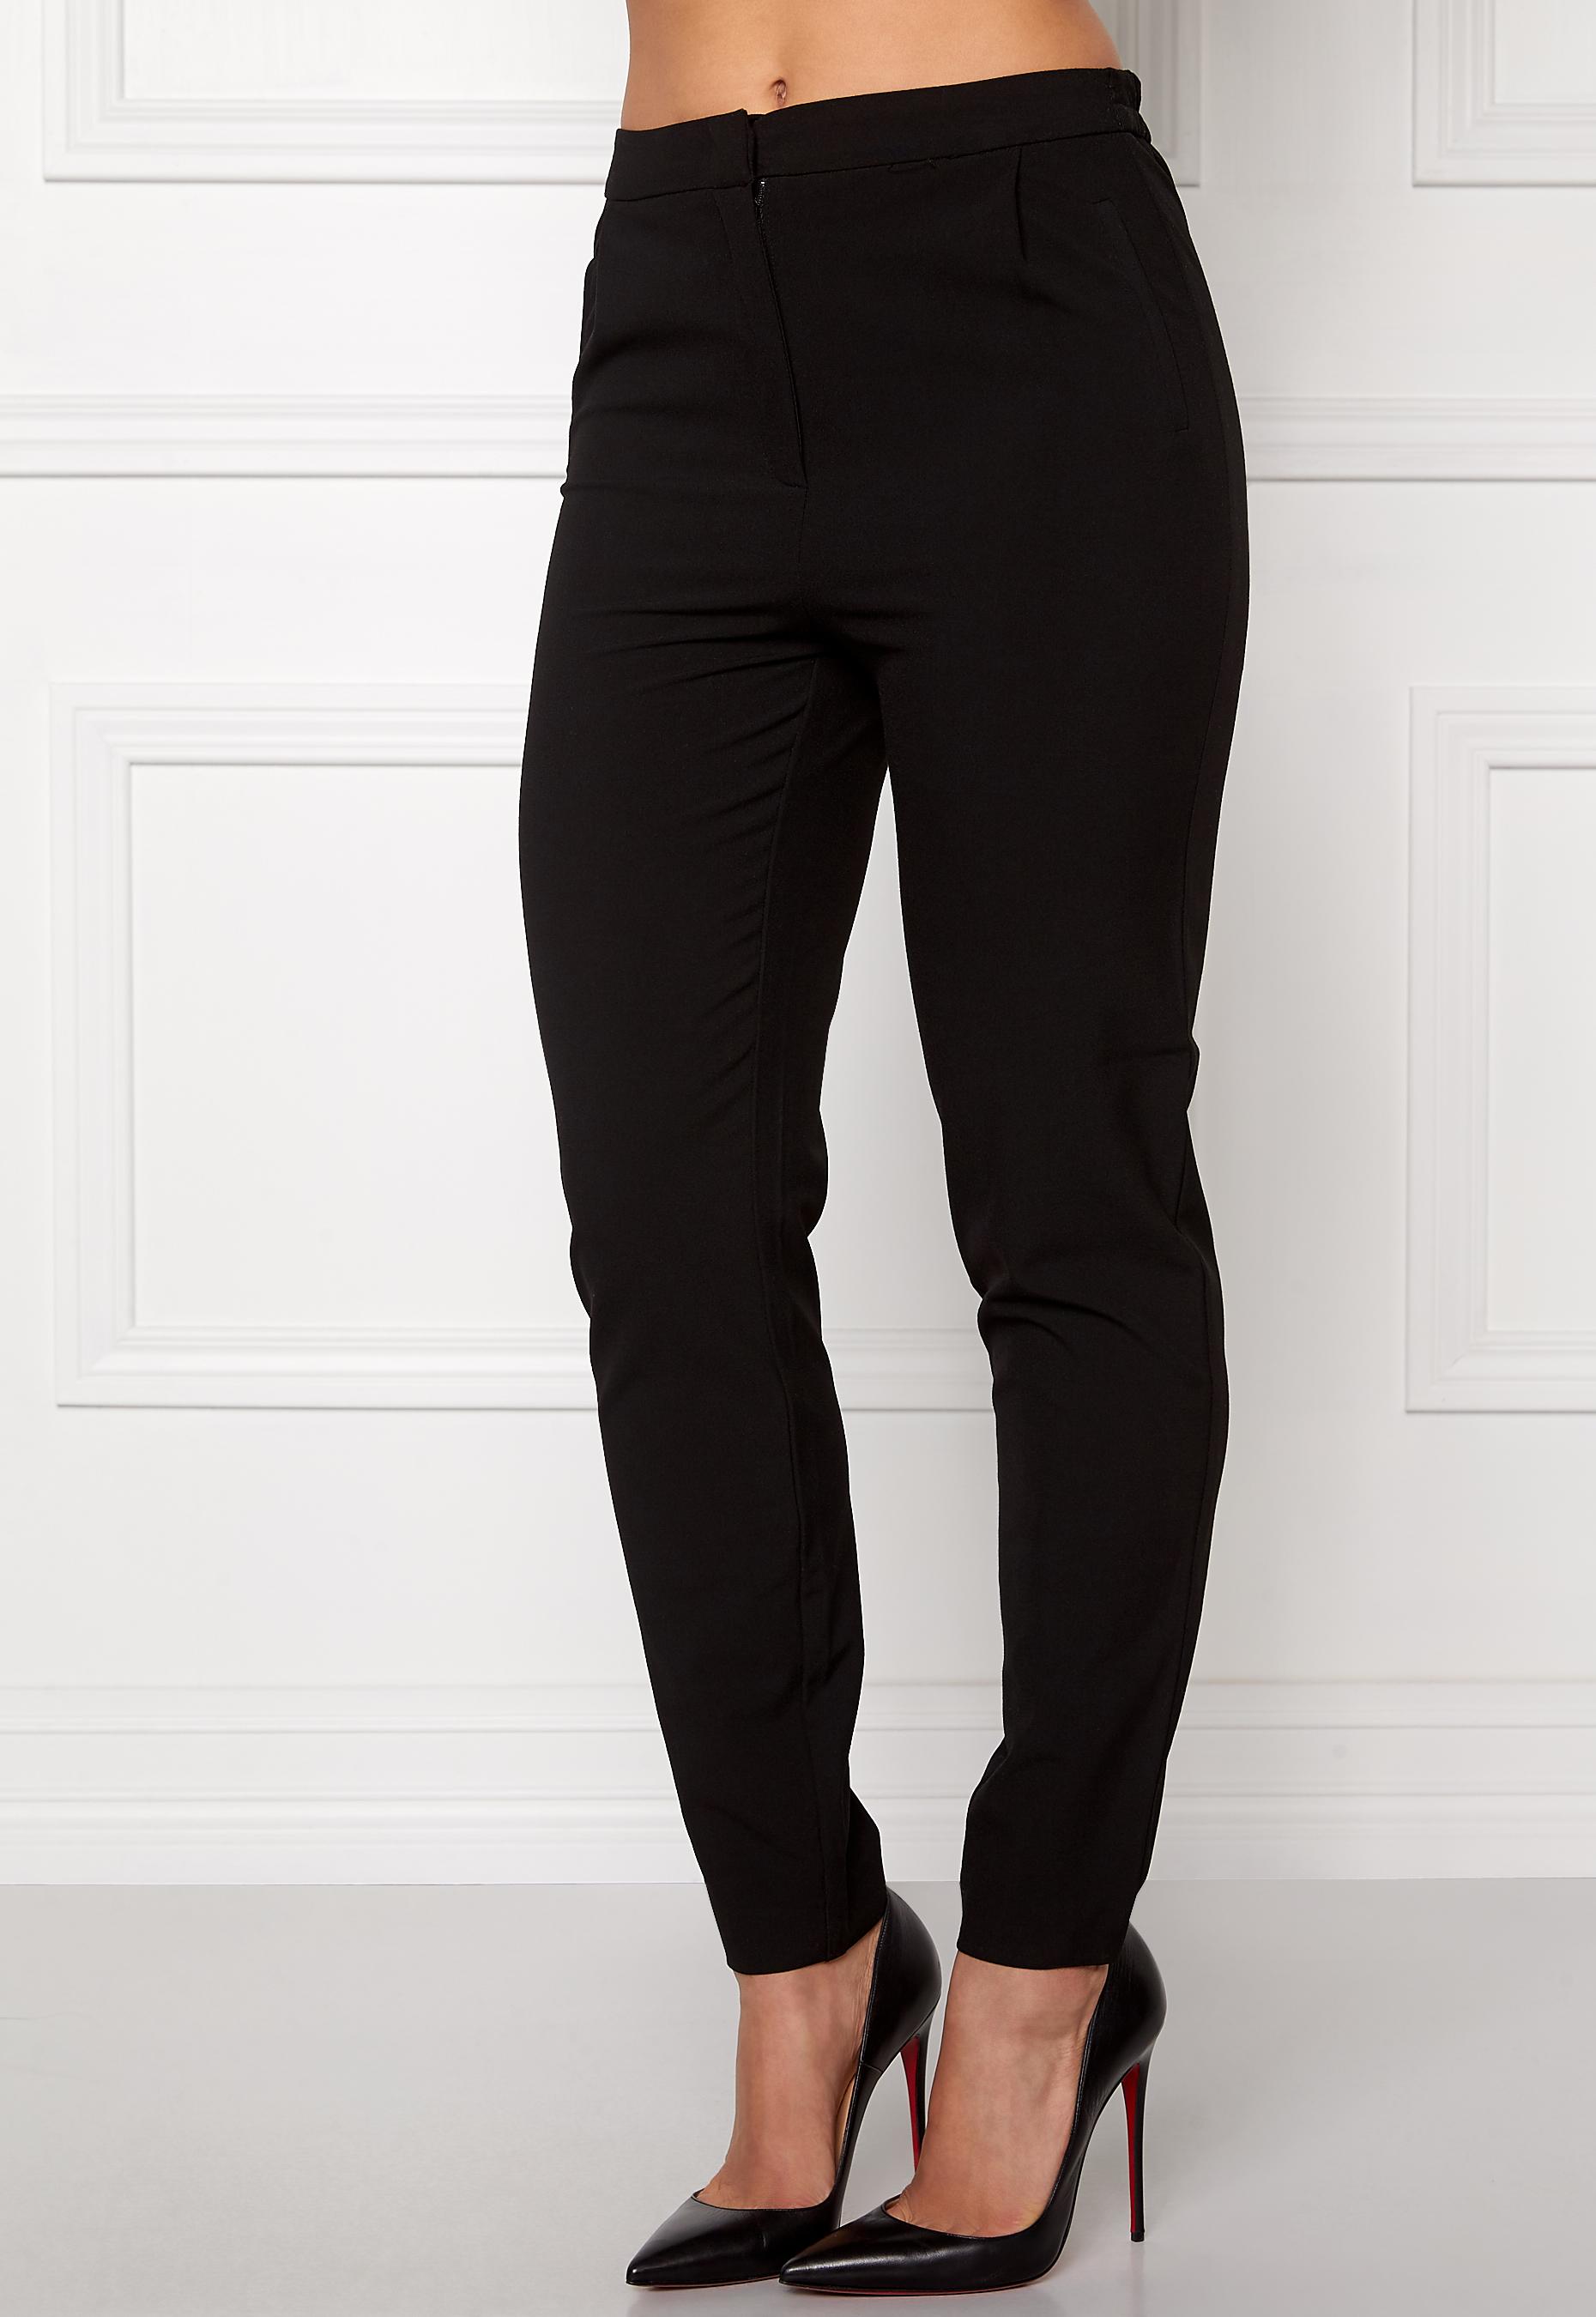 discount new products multiple colors VERO MODA Citrus Pants Black - Bubbleroom